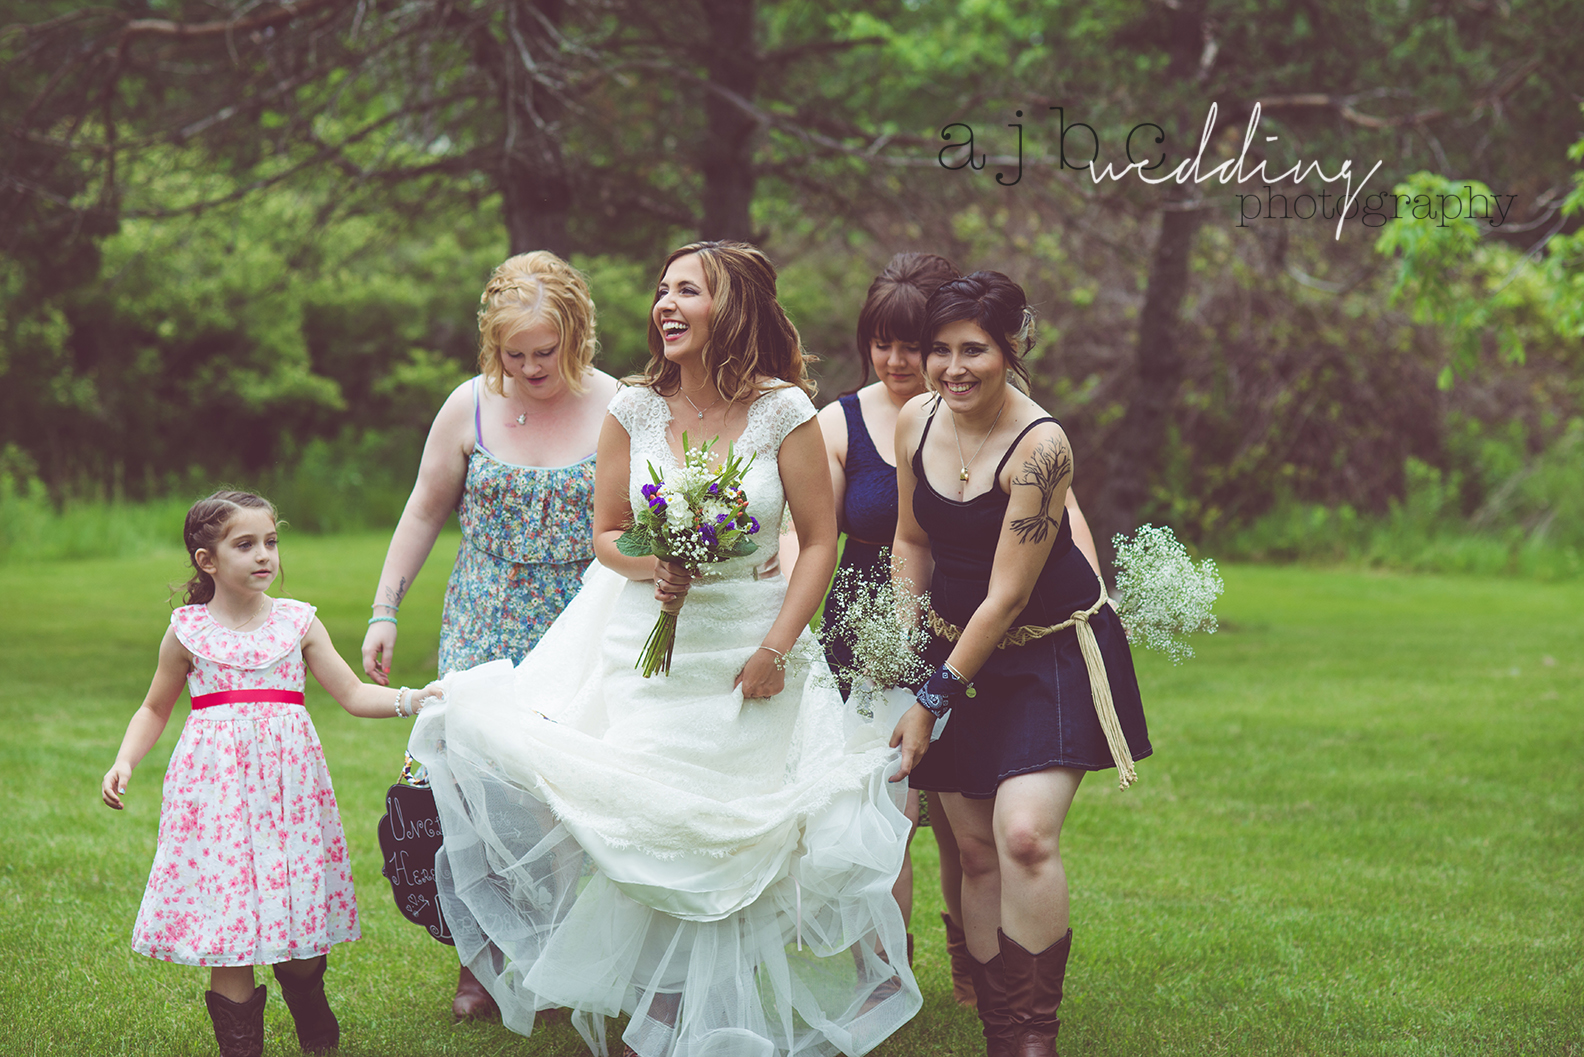 ajbcphotography-port-huron-michigan-wedding-photographer-outdoors-summer-wedding-country-wedding-wadhams-michigan-bride-vintage-wedding-family-love.jpg